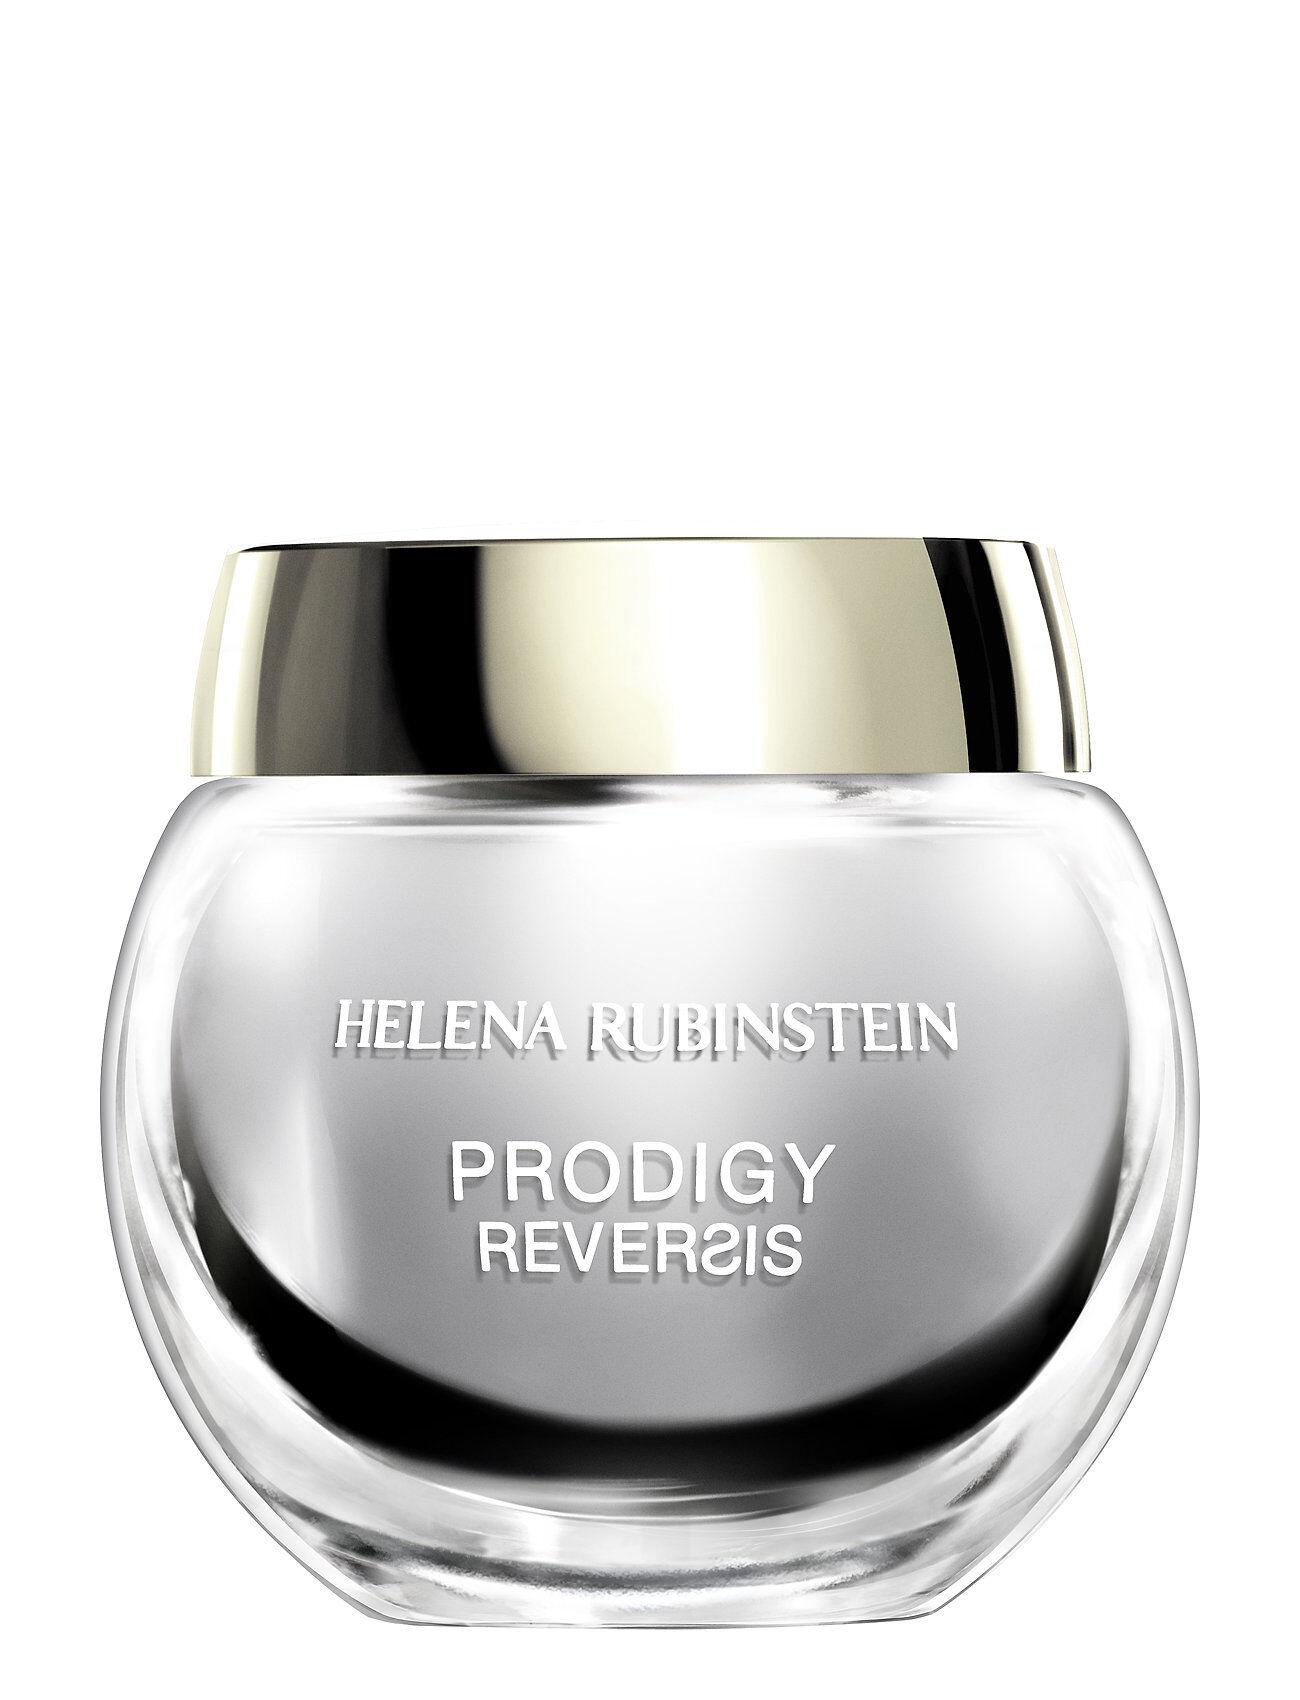 Helena Rubinstein Prodigy Reversis Creme Normal Skin 50 Ml